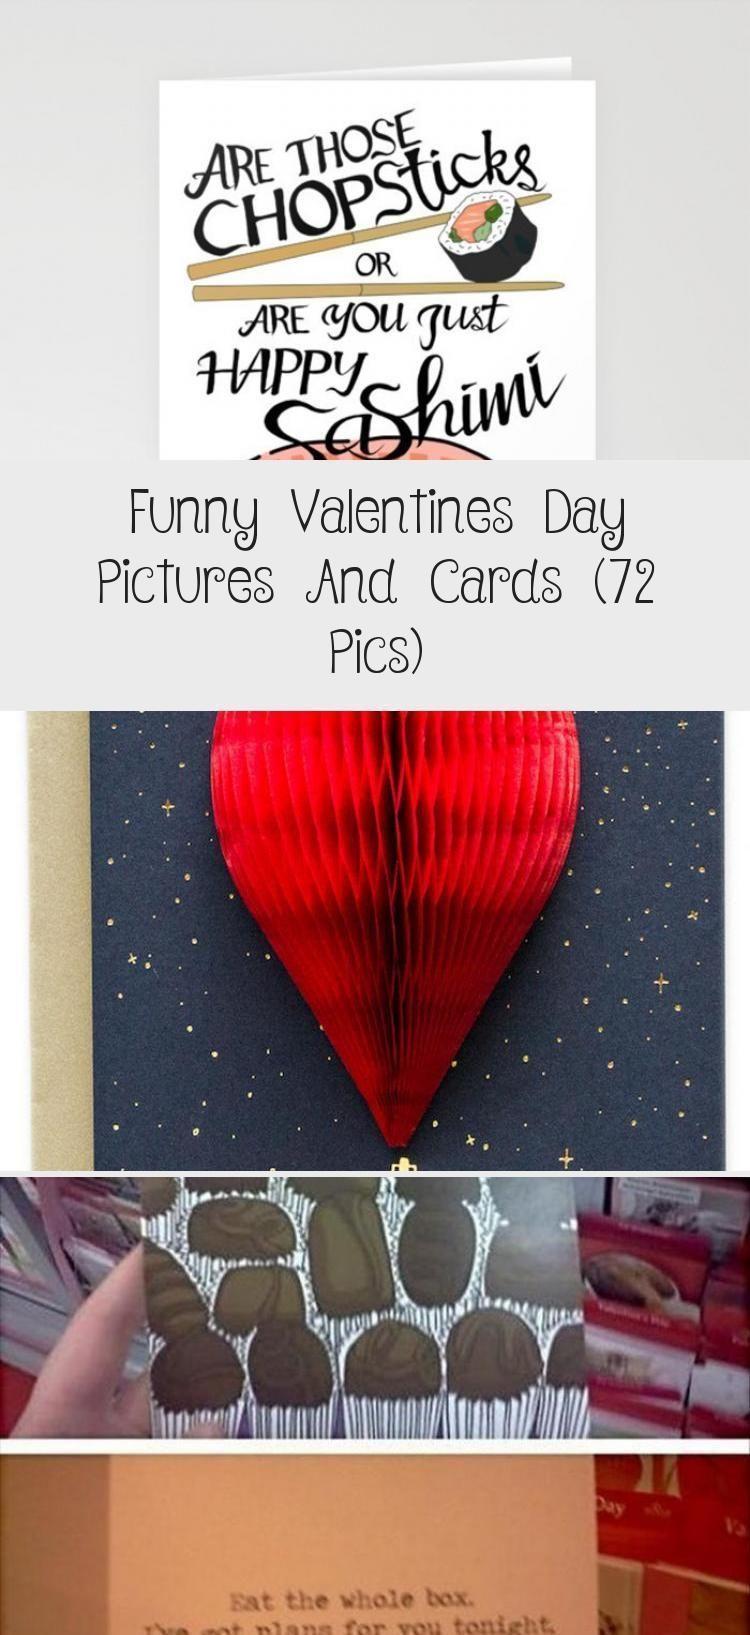 Memes Valentines Day Single Memes Valentines Day Funny Valentine Memes Valentines Memes Valentines Day Memes Single